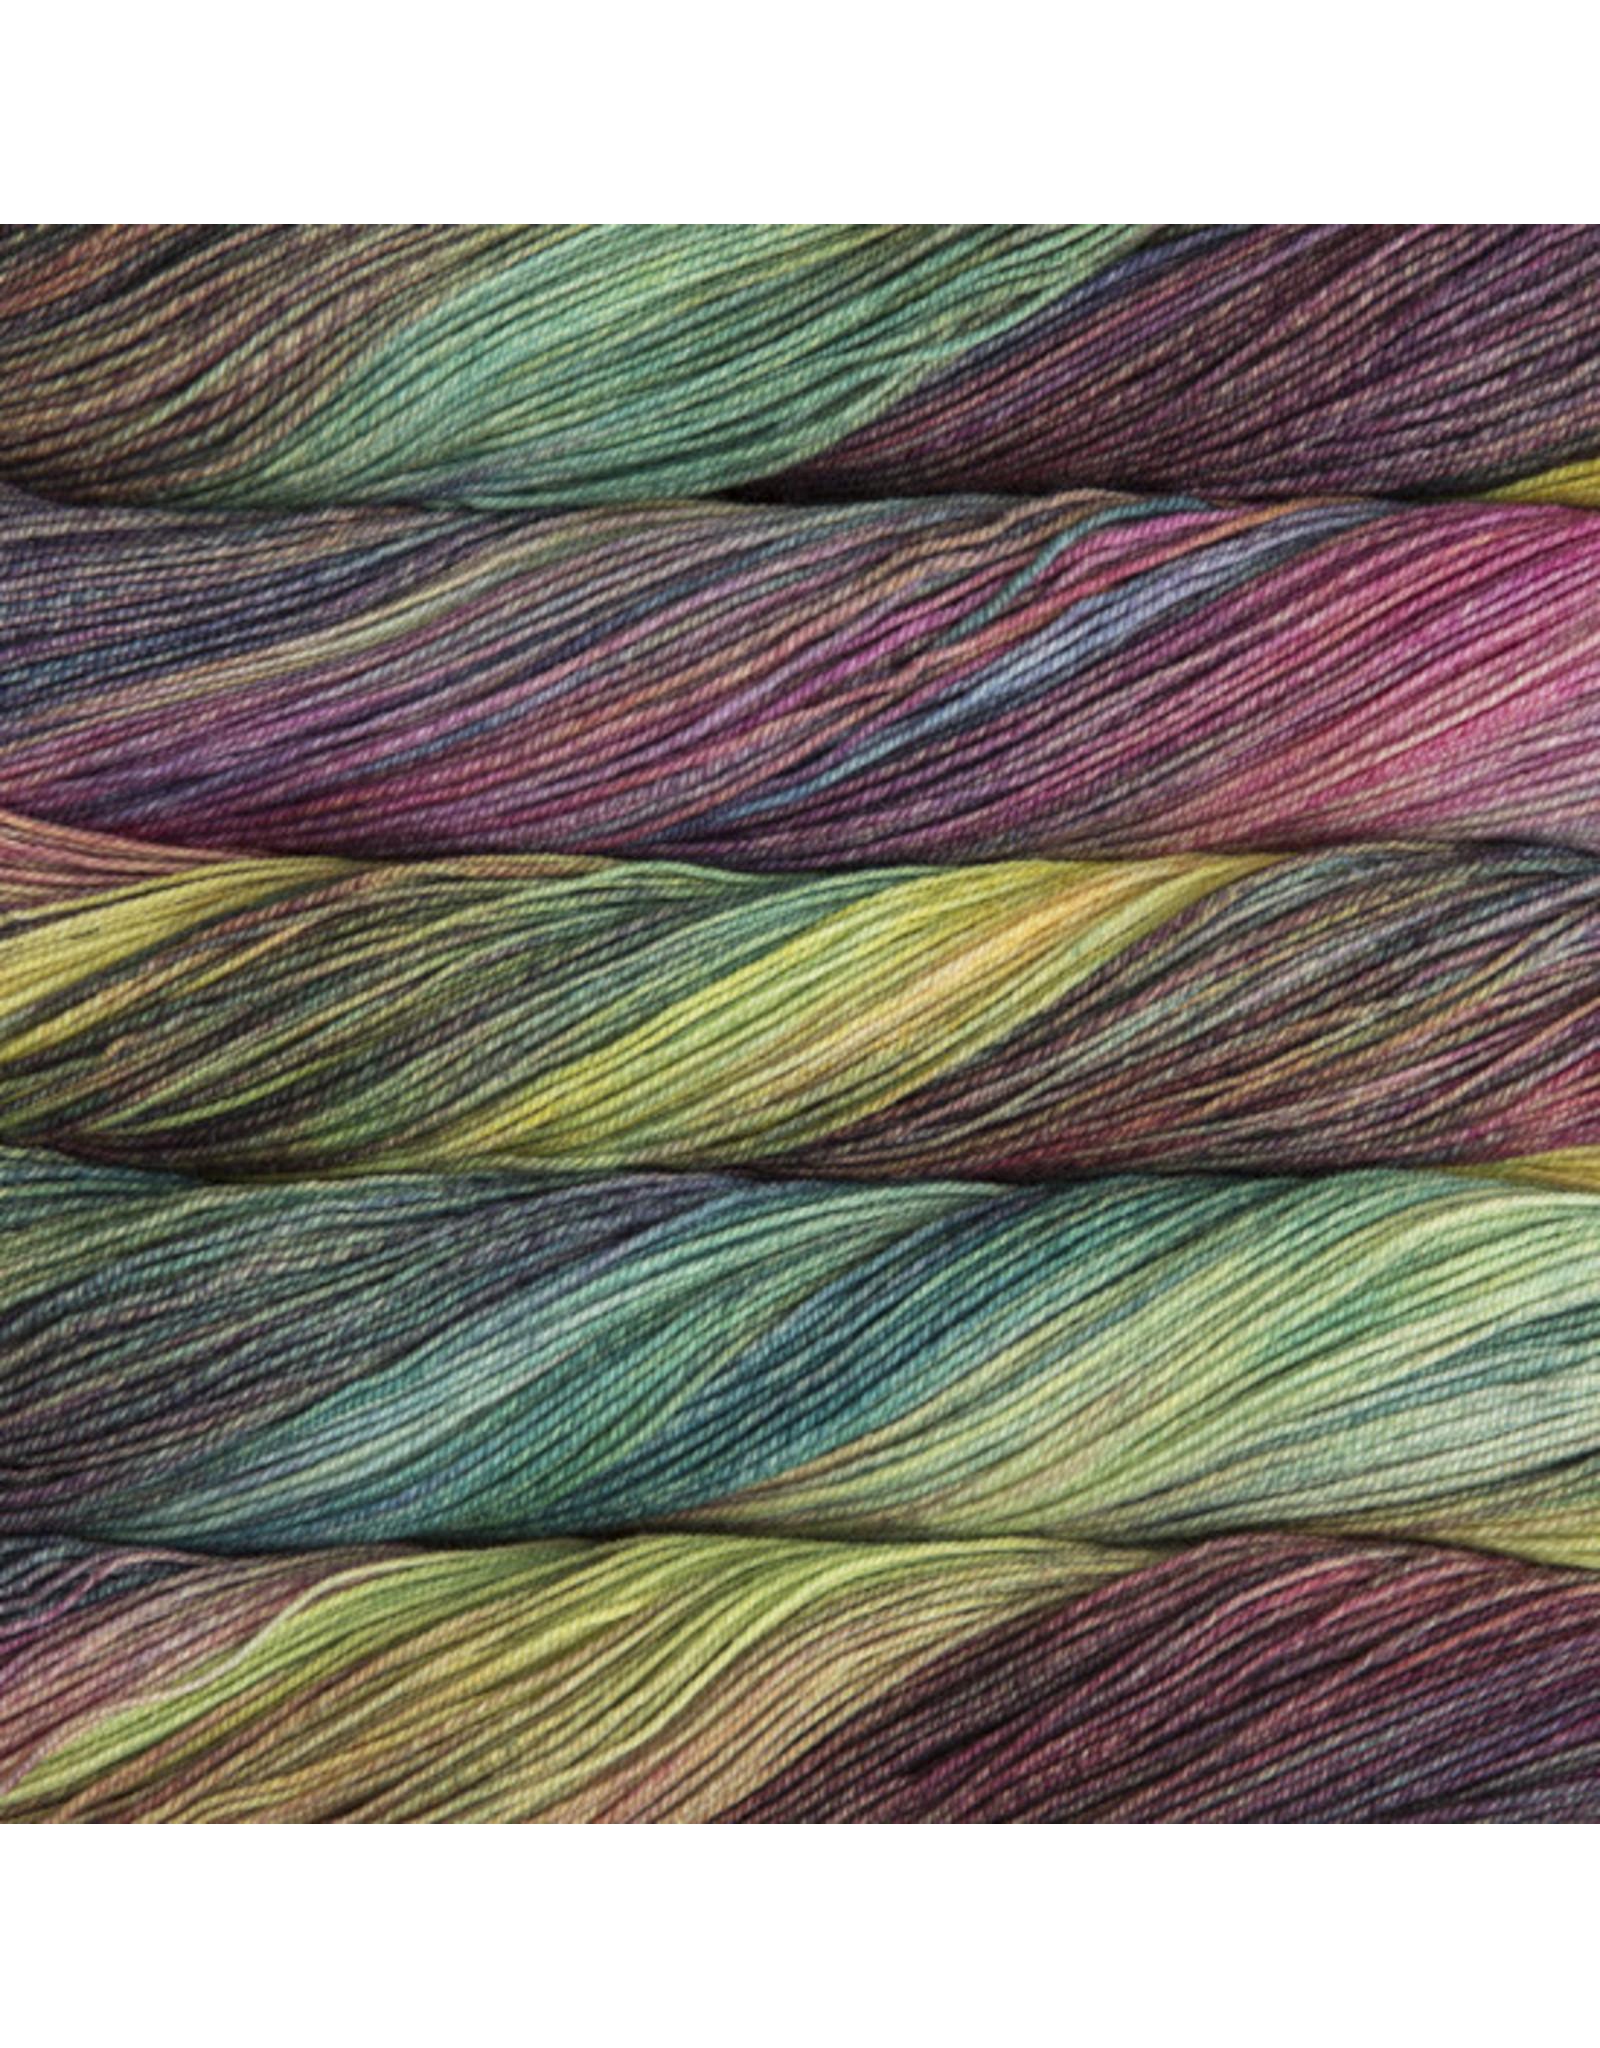 Malabrigo Arco Iris - Sock - Malabrigo